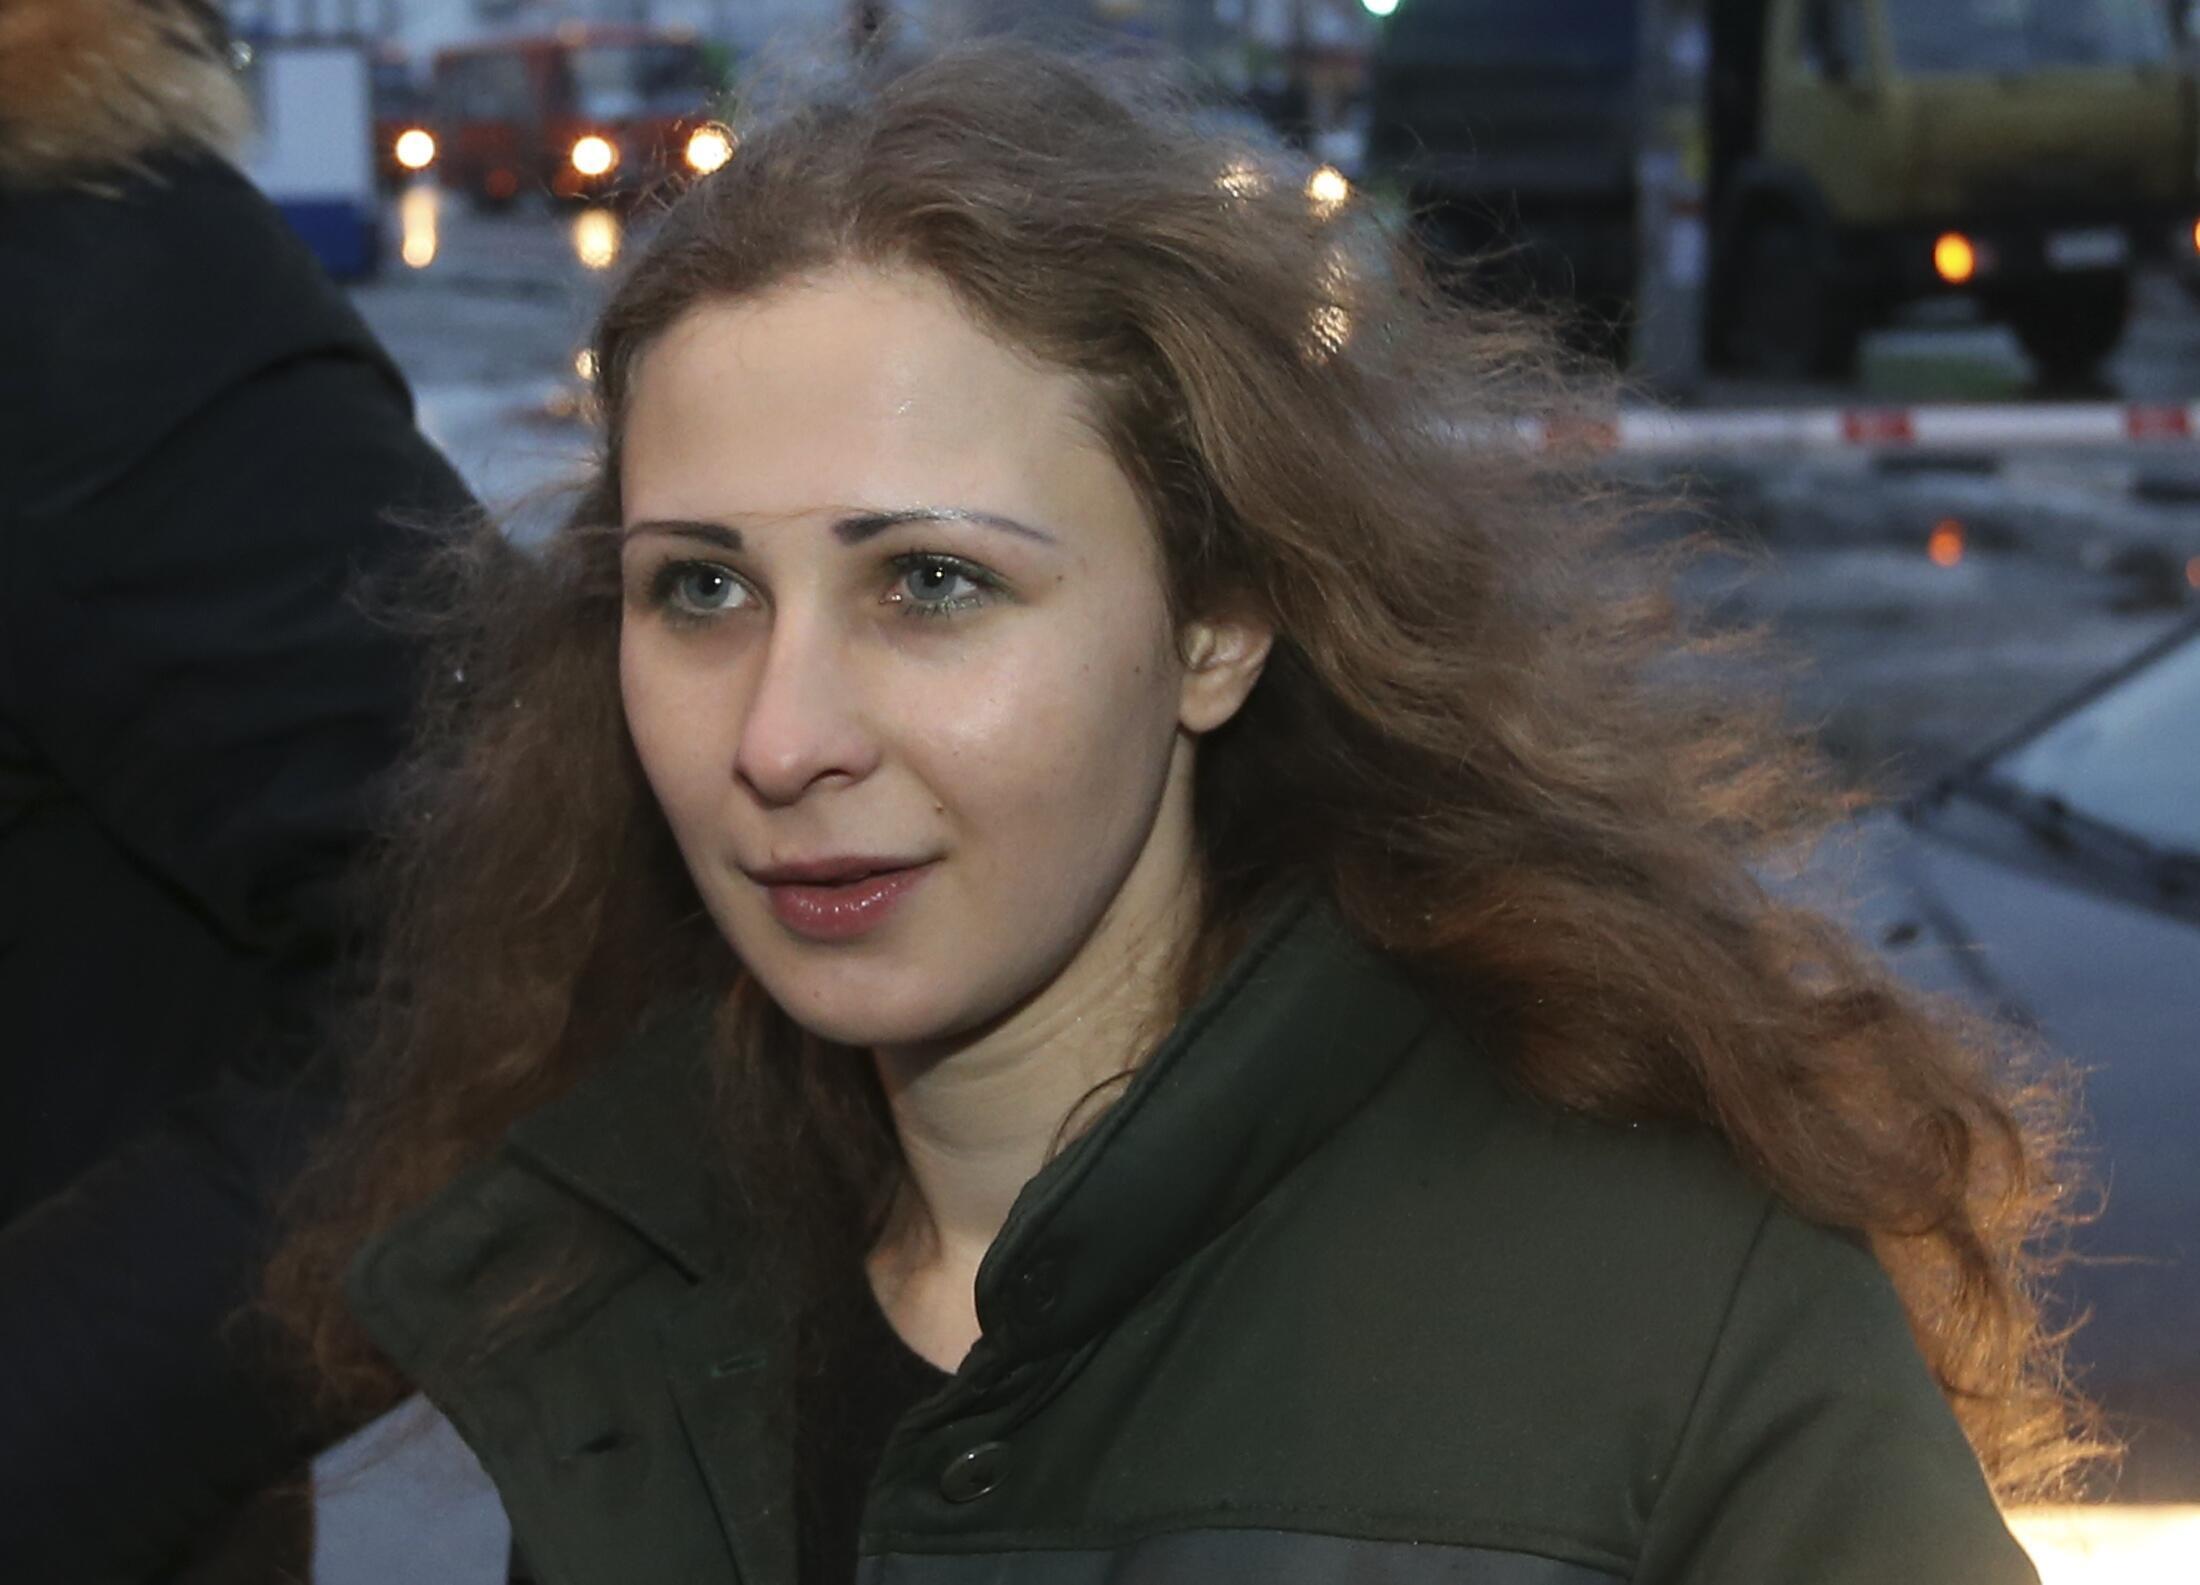 Maria Alekhina foi a primeira integrante do grupo Pussy Riot a beneficiar da anistia nesta segunda-feira, 23 de dezembro de 2013.